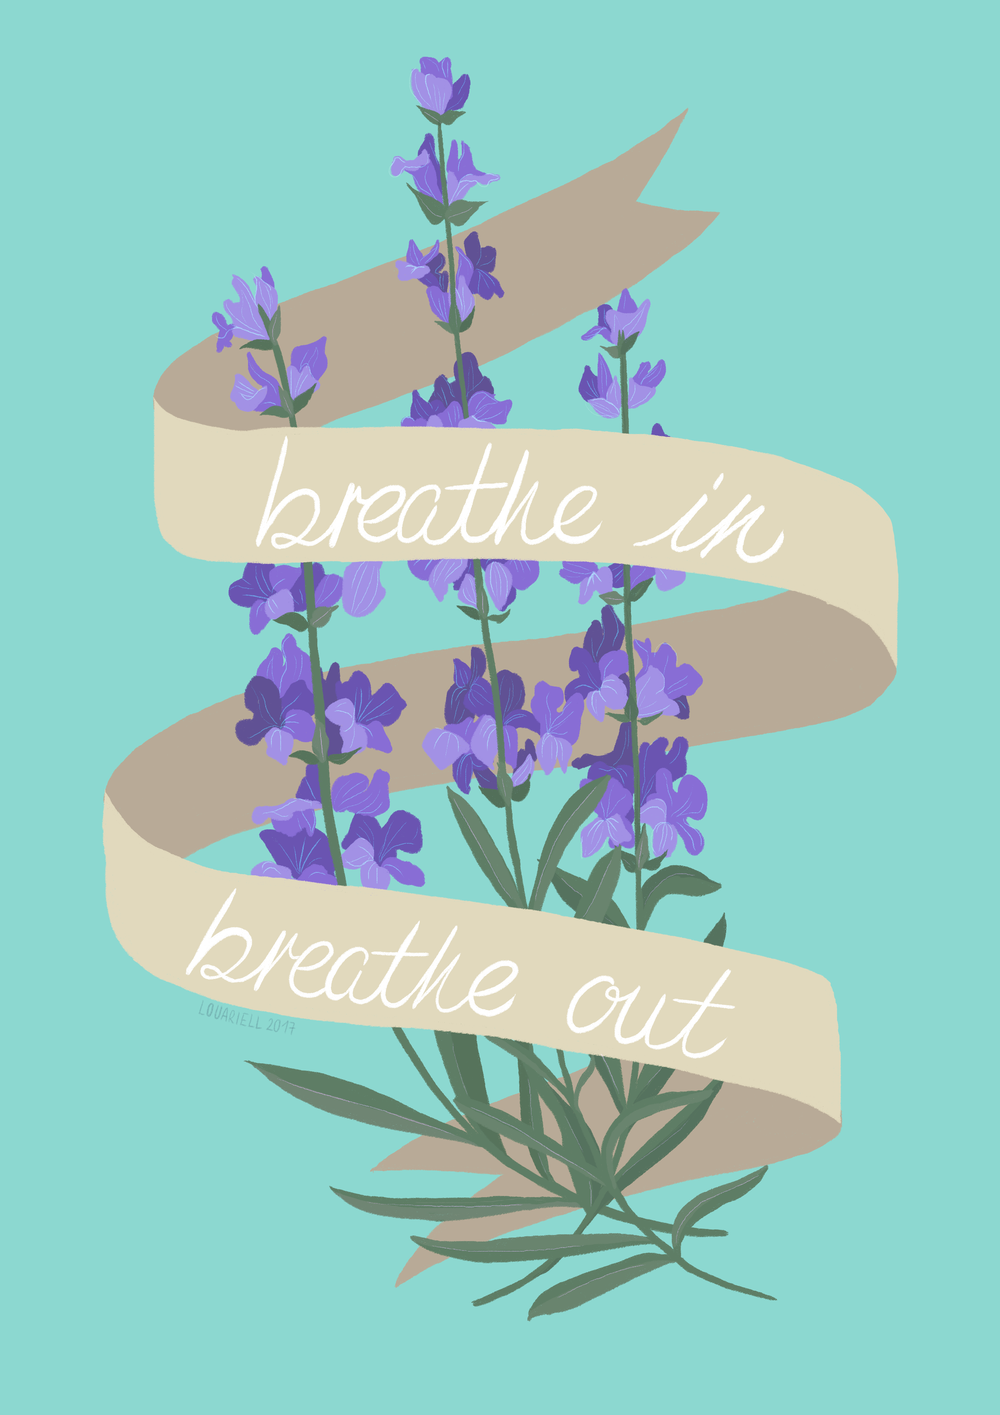 lgfleuri_breathe2019.png